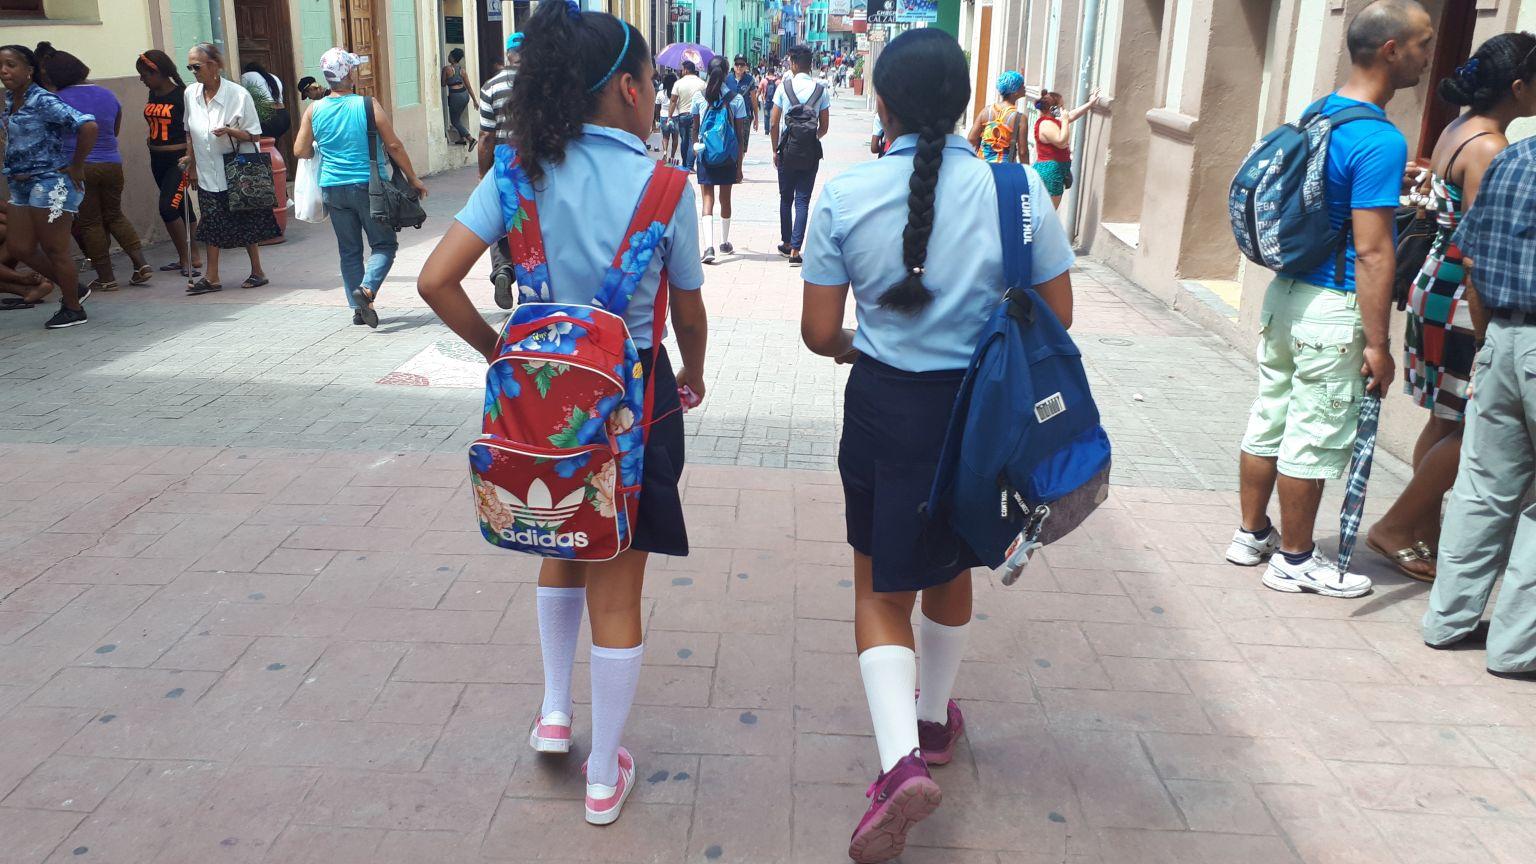 Licealiści